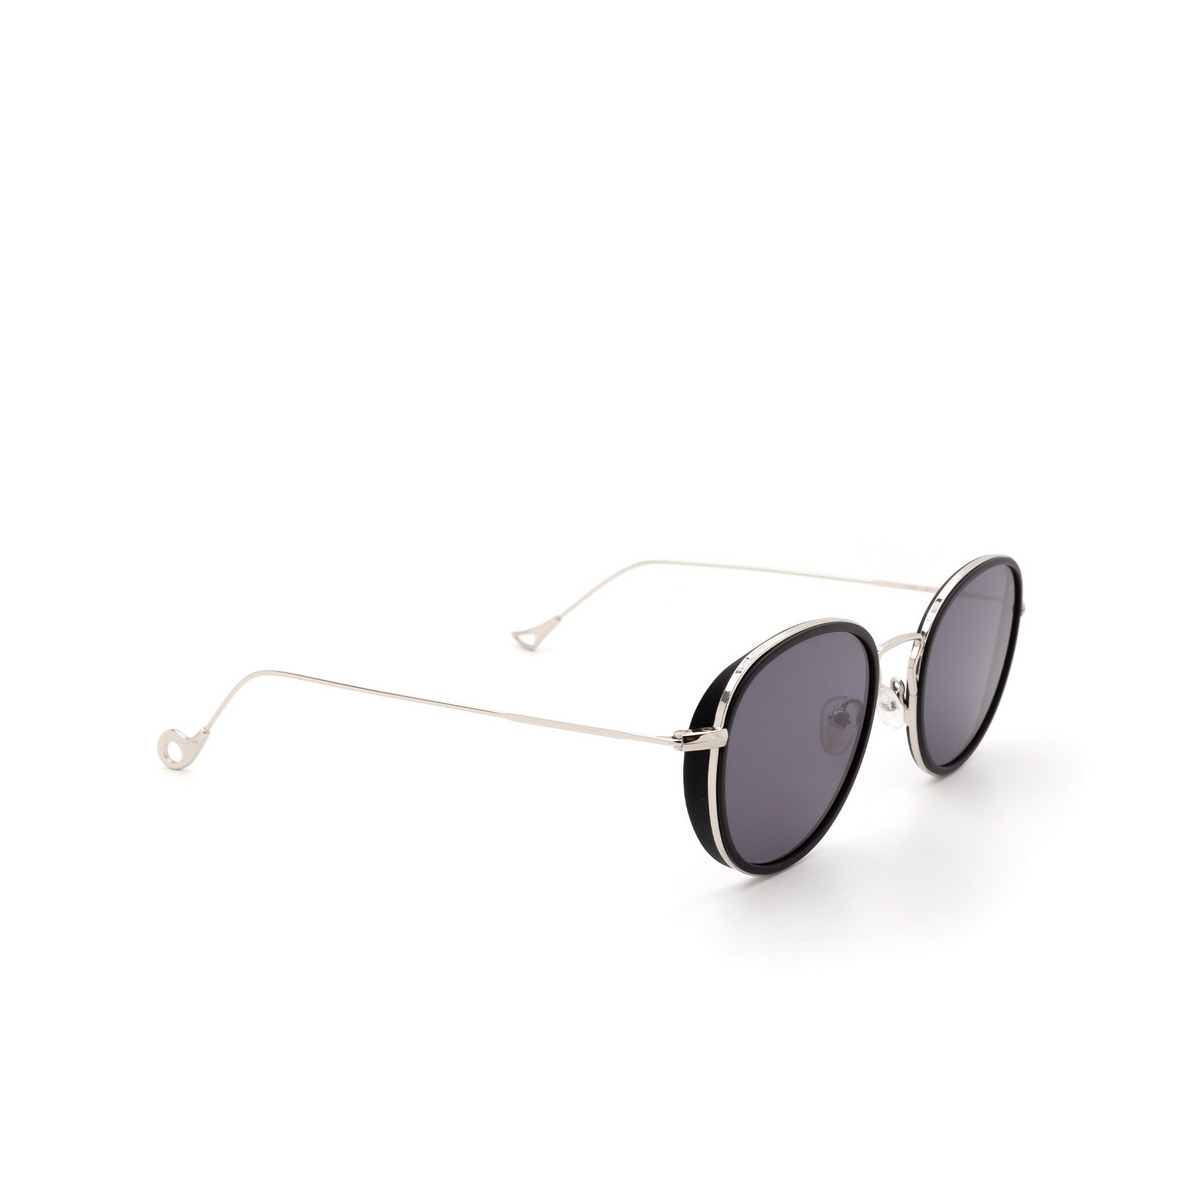 eyepetizer-pier-cb-1-7 (1)